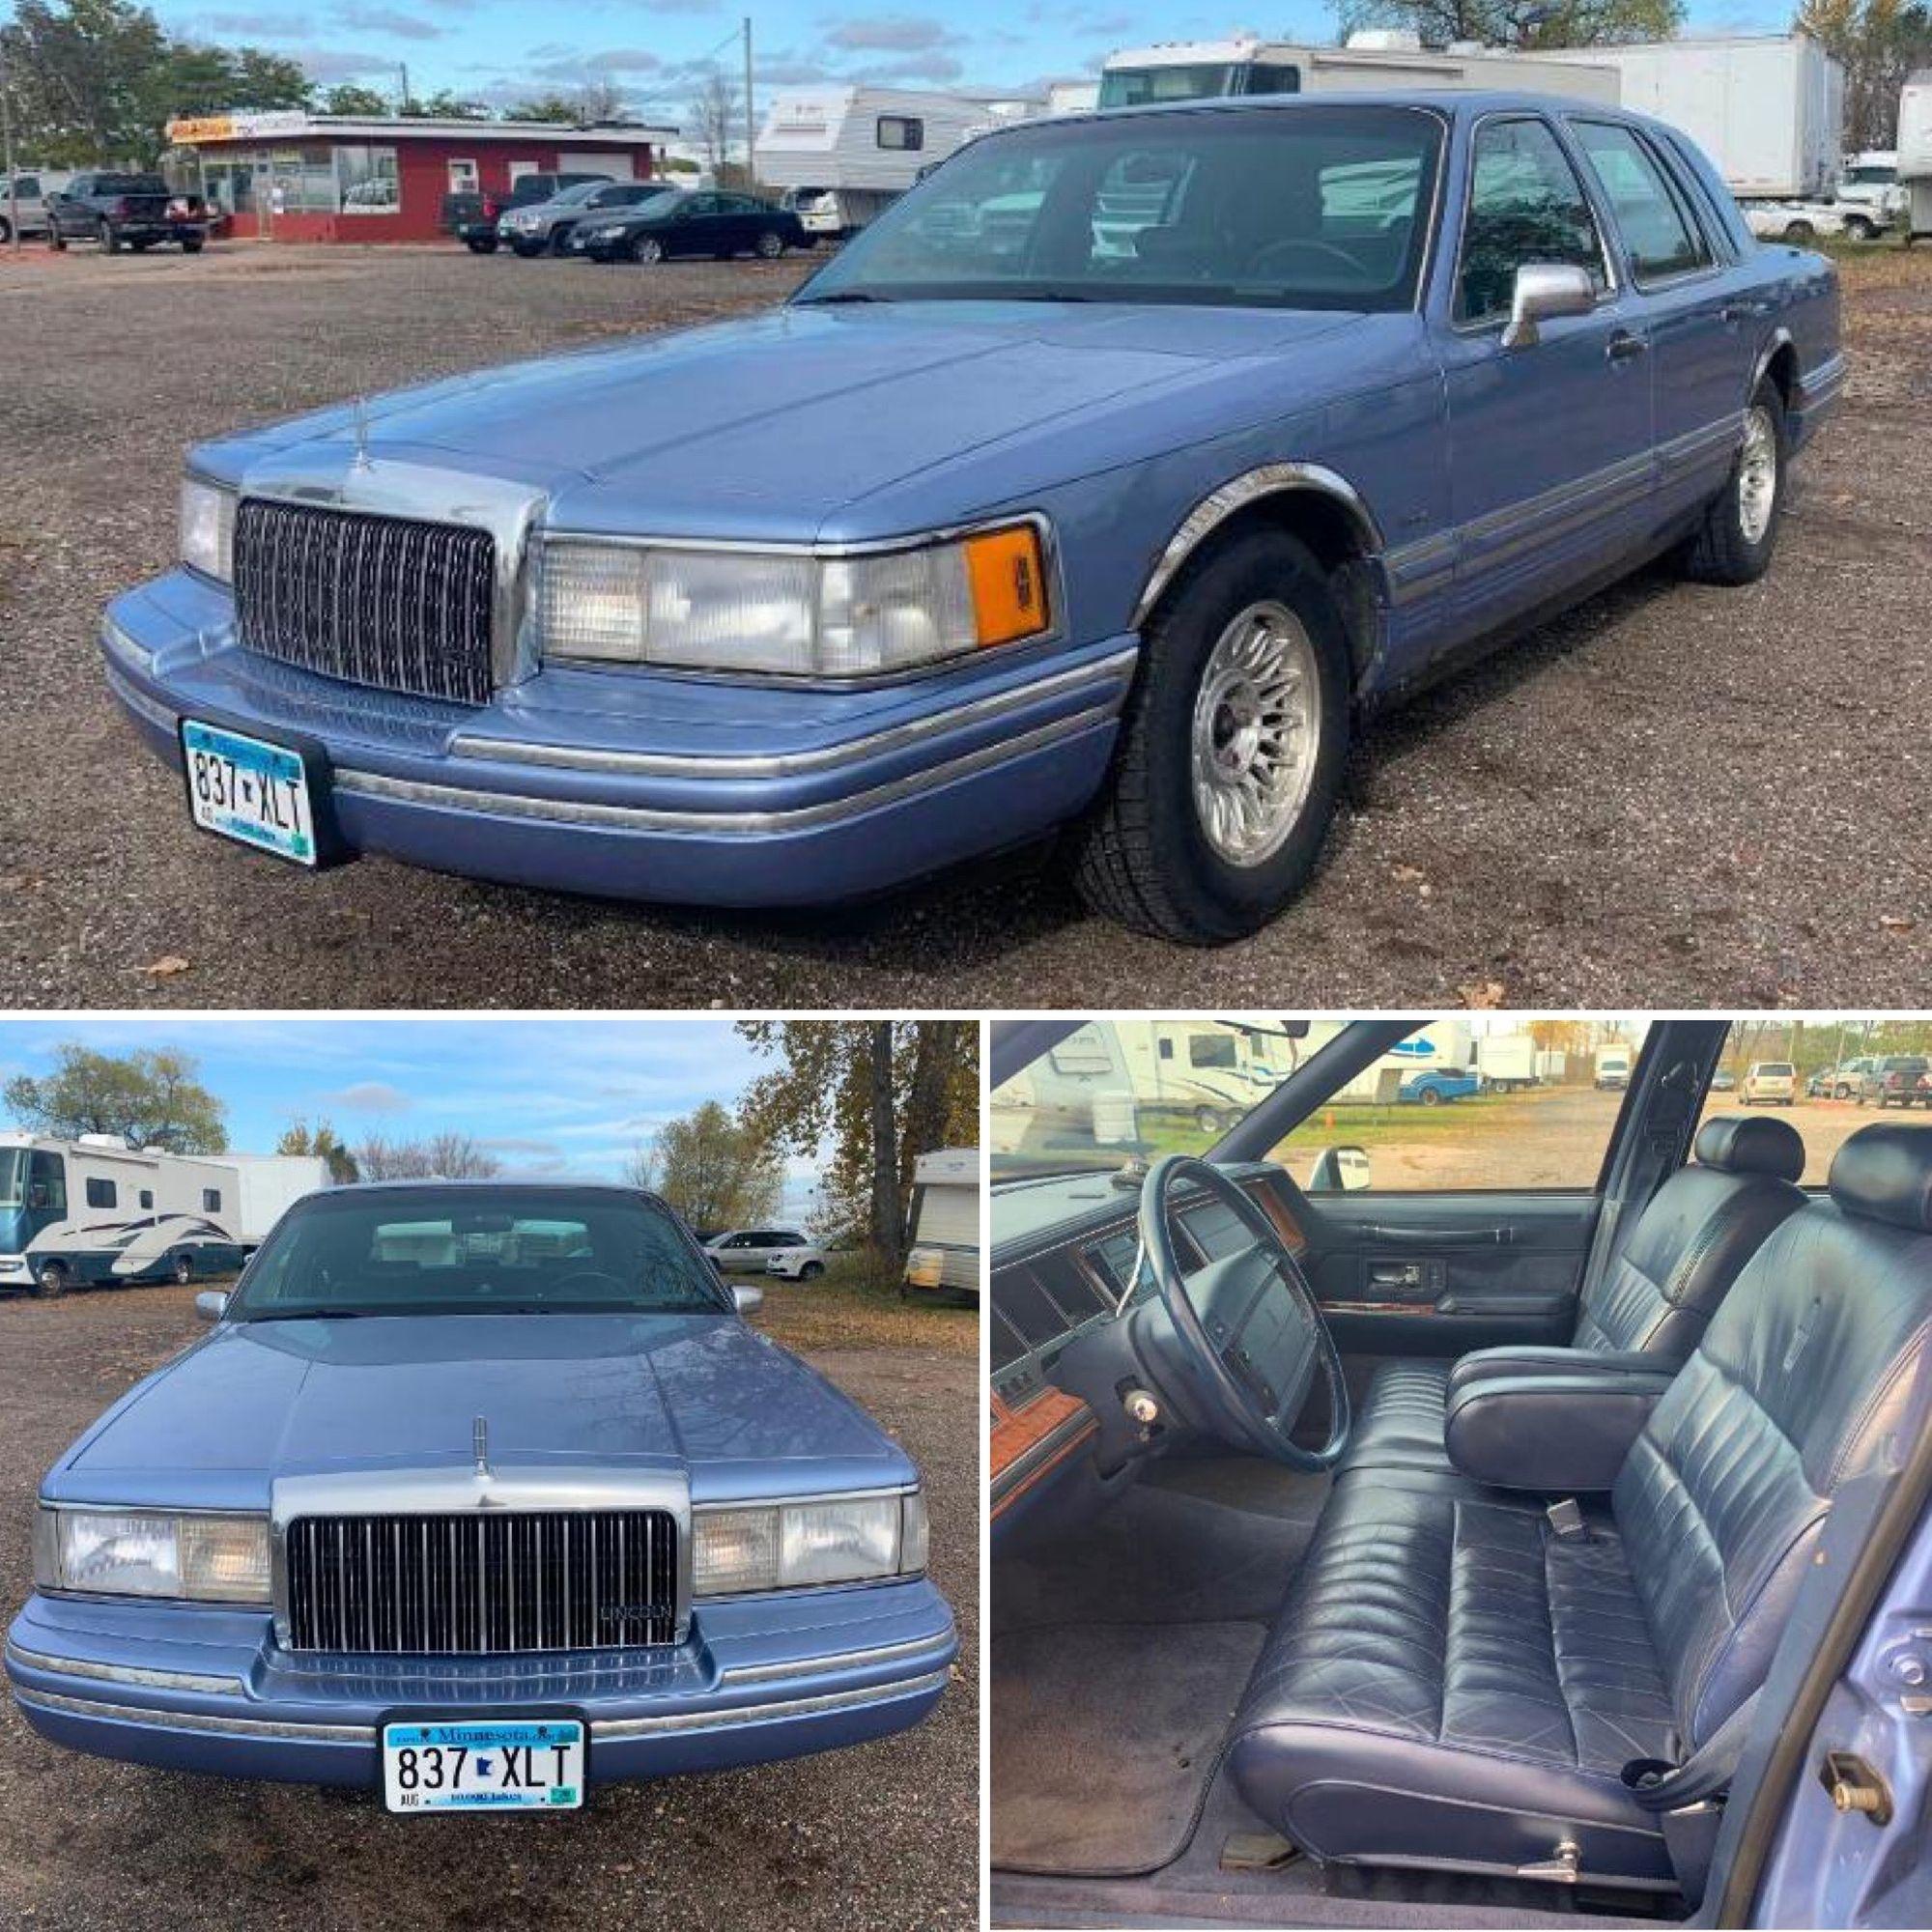 1994 Lincoln Town Car 156 156 Miles Buffalo Mn Browse Bid Online Today Https Www Bid 2 Bu In 2020 Lincoln Town Car Automotive Repair Shop Automotive Repair